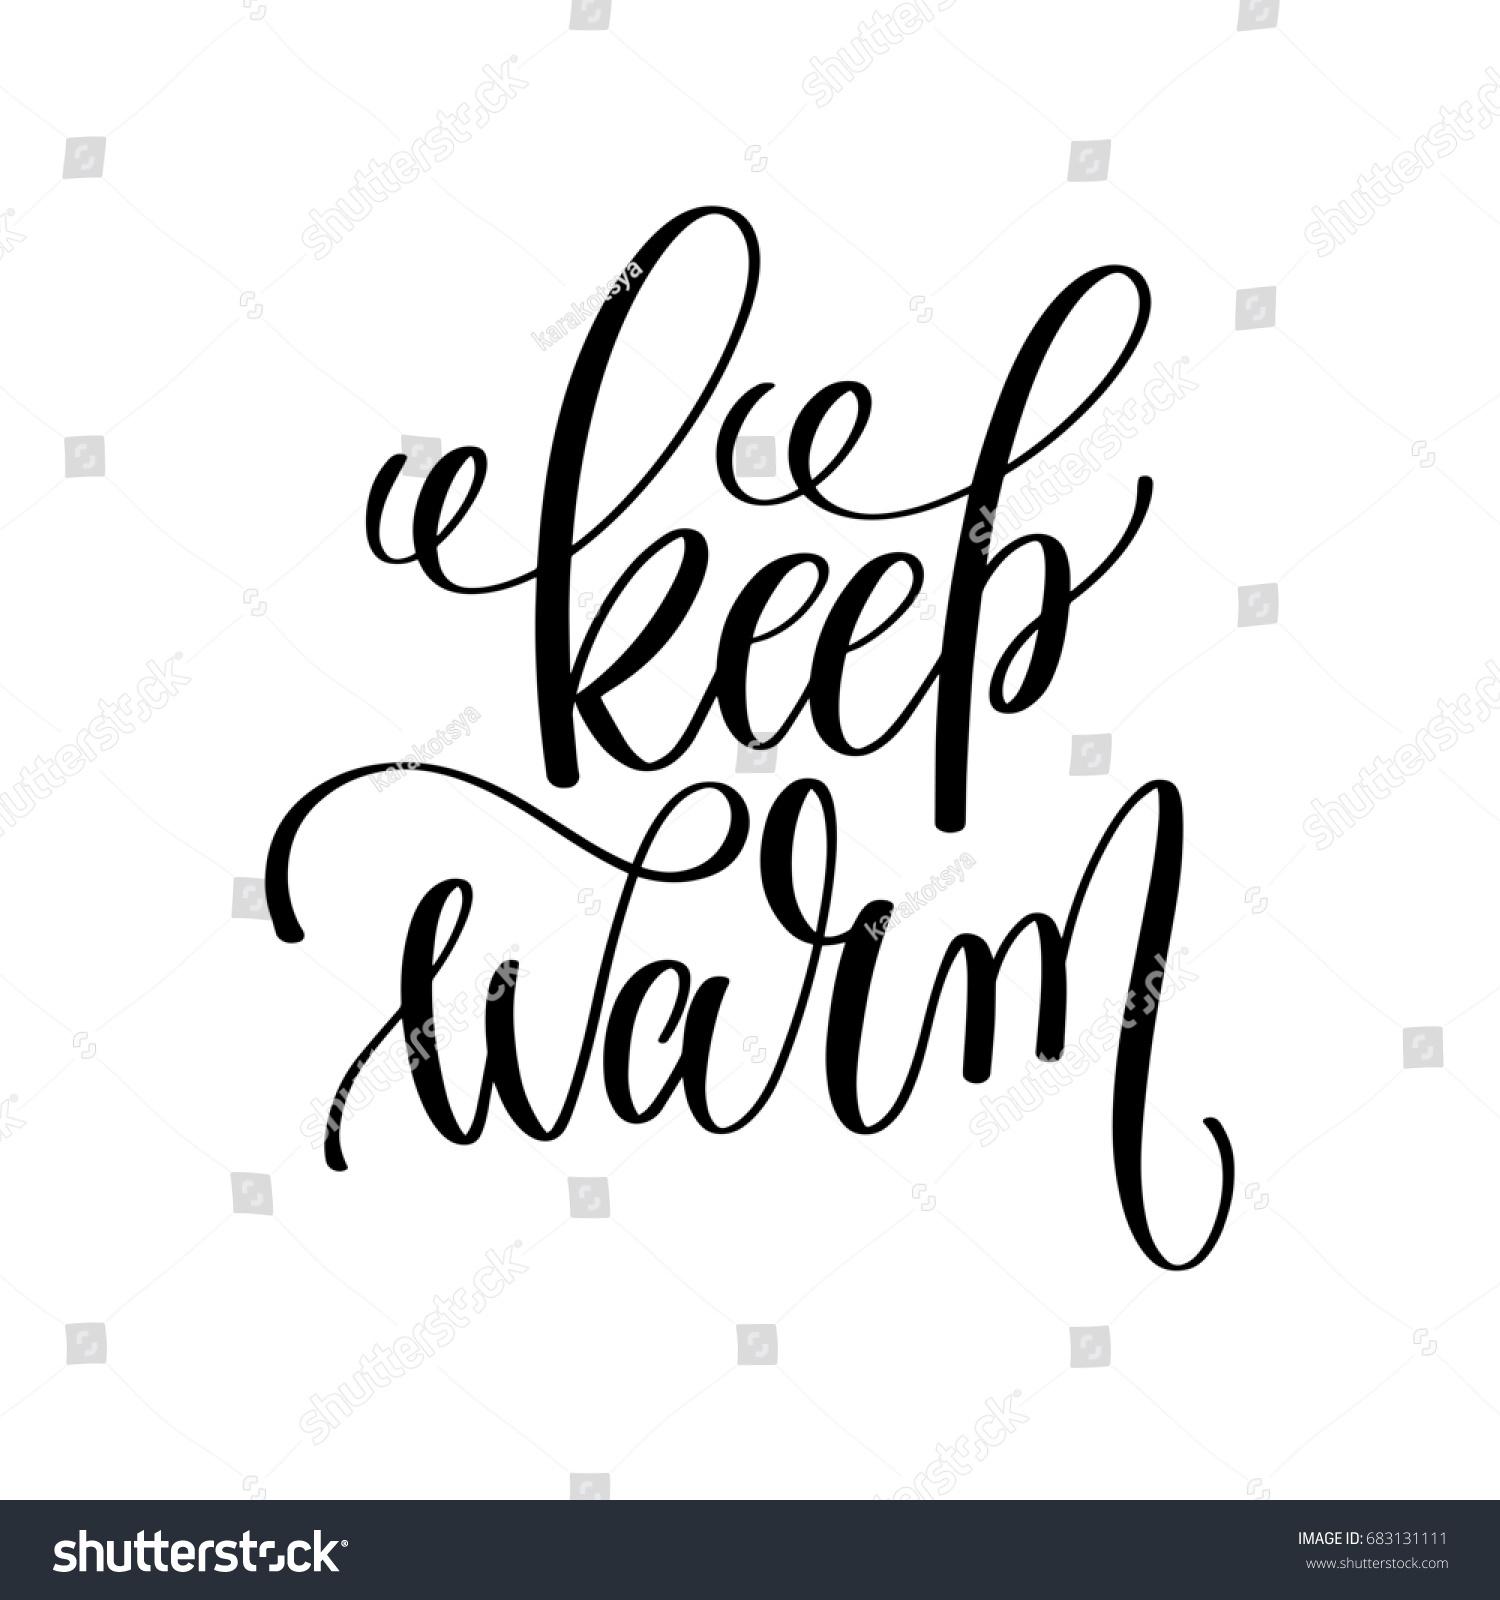 c959776f3c6e Keep Warm Hand Lettering Inscription Winter Stock Illustration ...